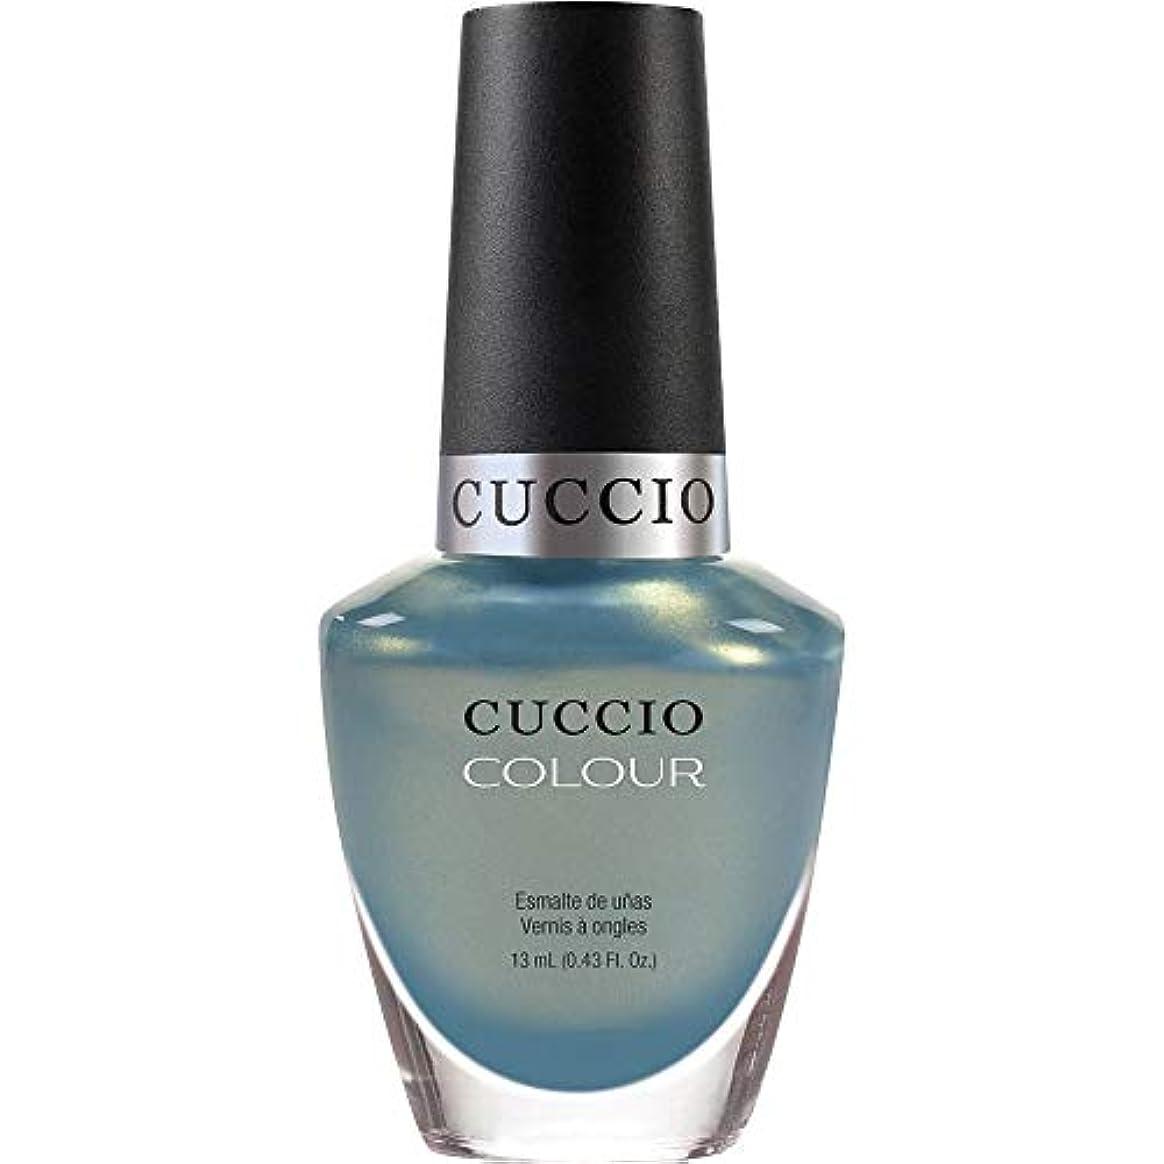 蚊航空会社意気揚々Cuccio Colour Gloss Lacquer - Shore Thing - 0.43oz / 13ml